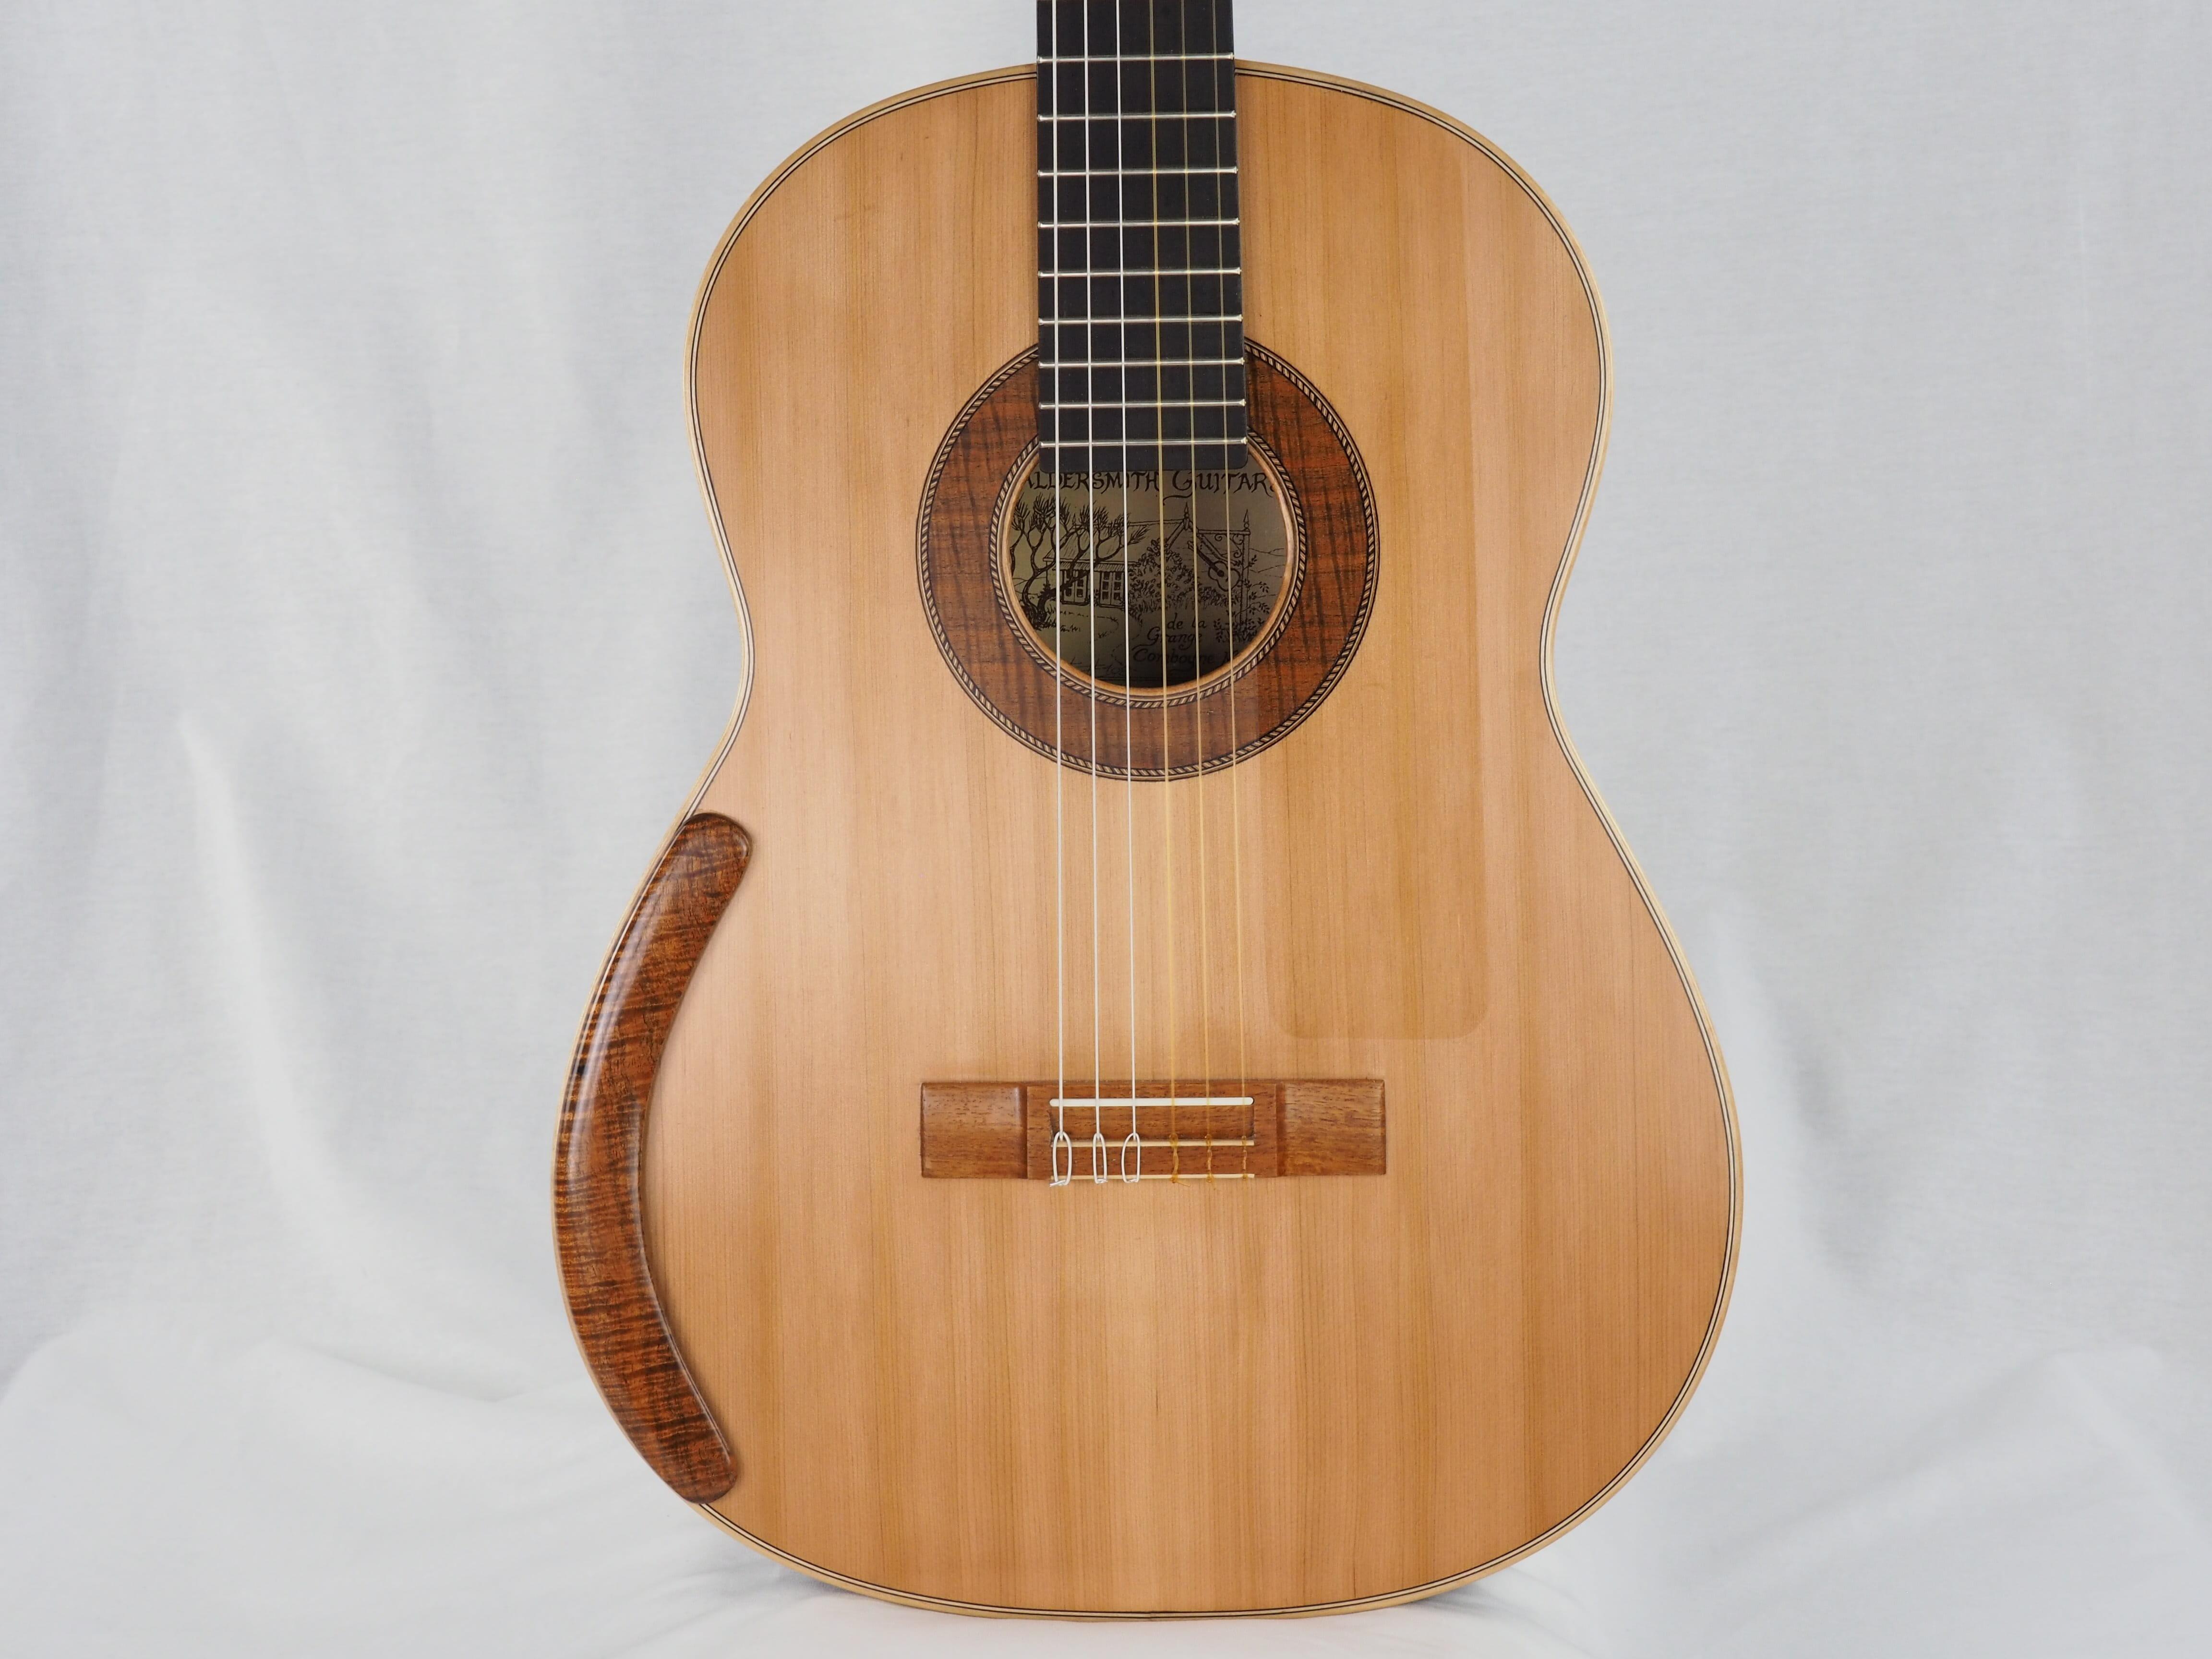 luthier graham caldersmith n 108 concert australie guitare classique de concert. Black Bedroom Furniture Sets. Home Design Ideas